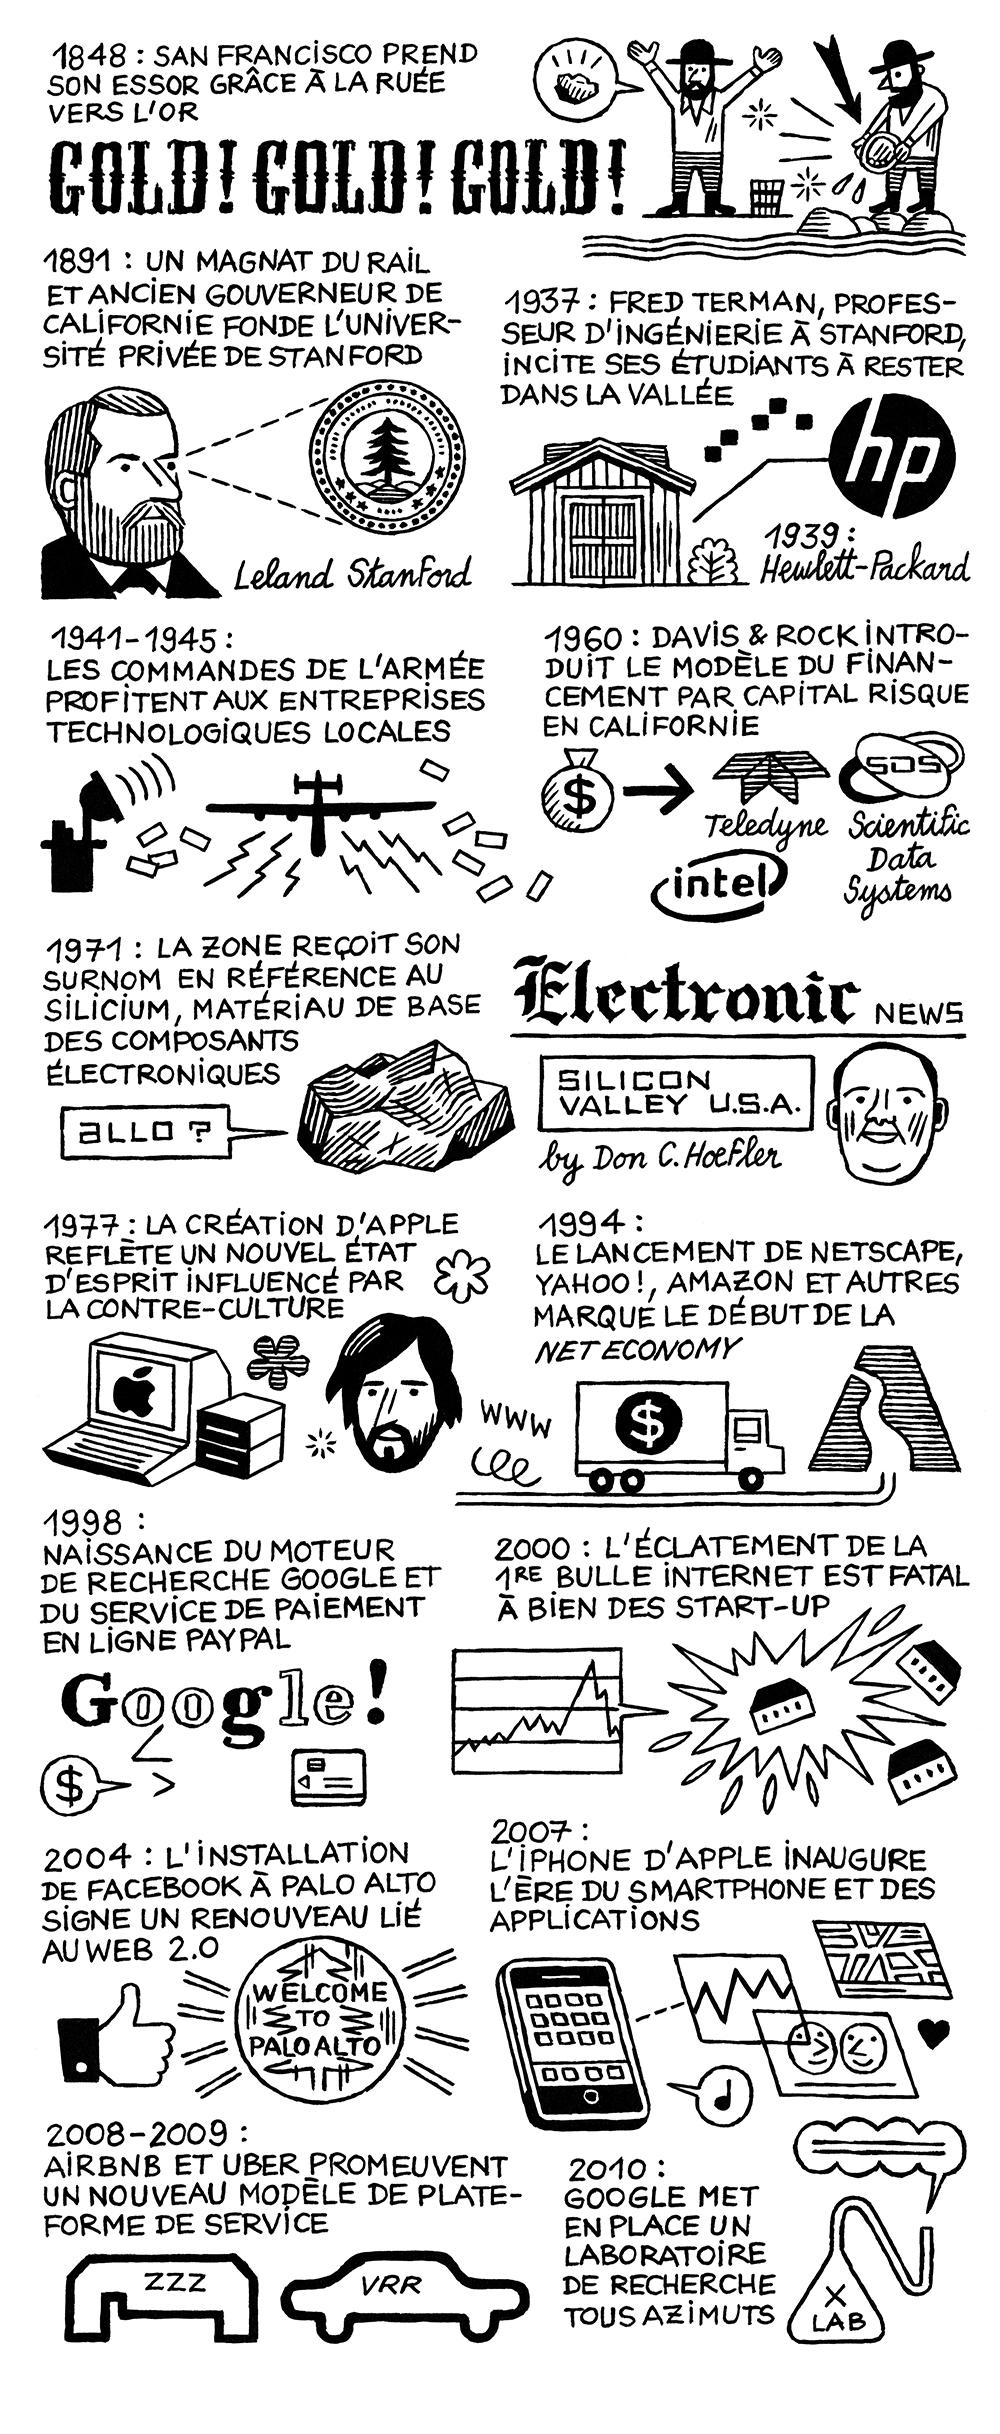 Conception et documentation MARTIN MAUGER